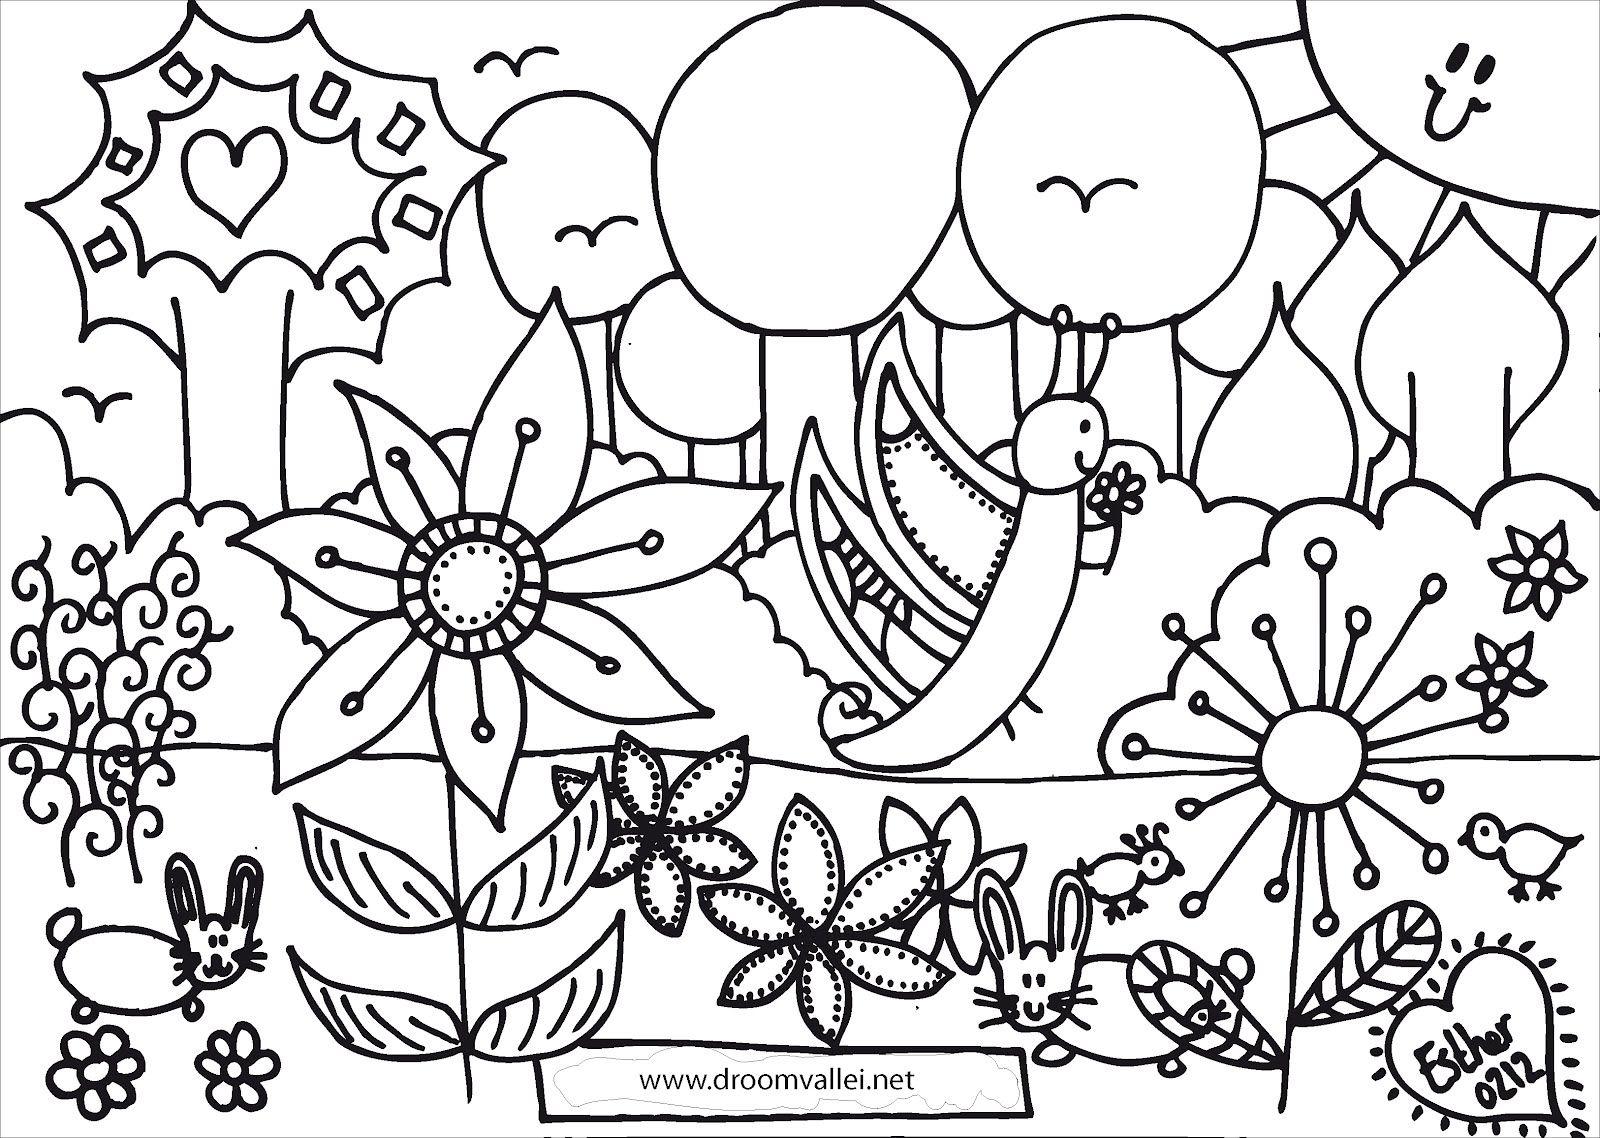 Kleurplaat2bvlinder Jpg Jpeg Afbeelding 1600 1138 Pixels Kleurplaten Bloem Kleurplaten Kleurplaten Voor Kinderen